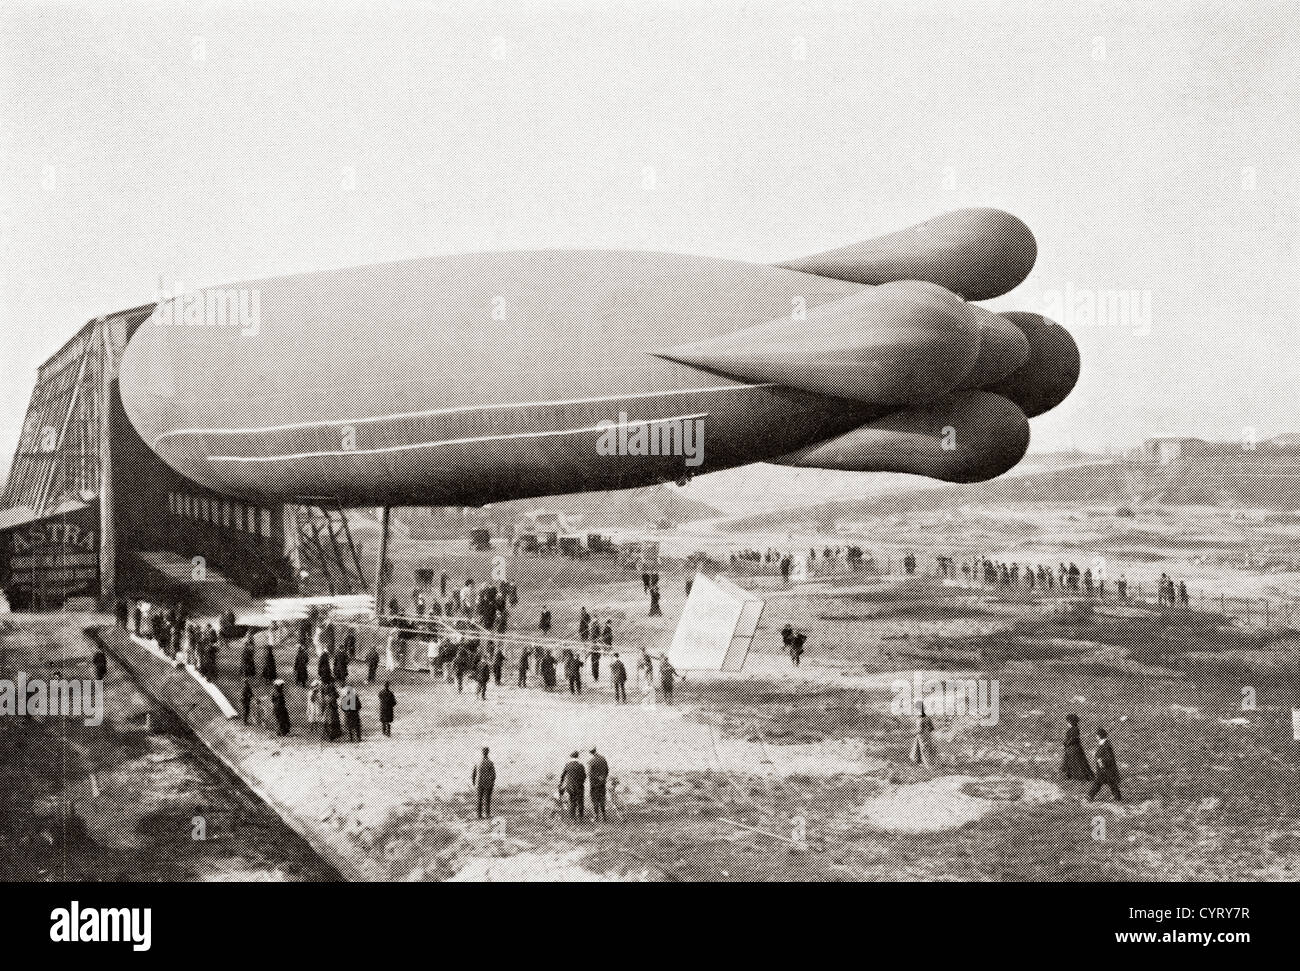 A Clément-Bayard Airship in 1909. - Stock Image